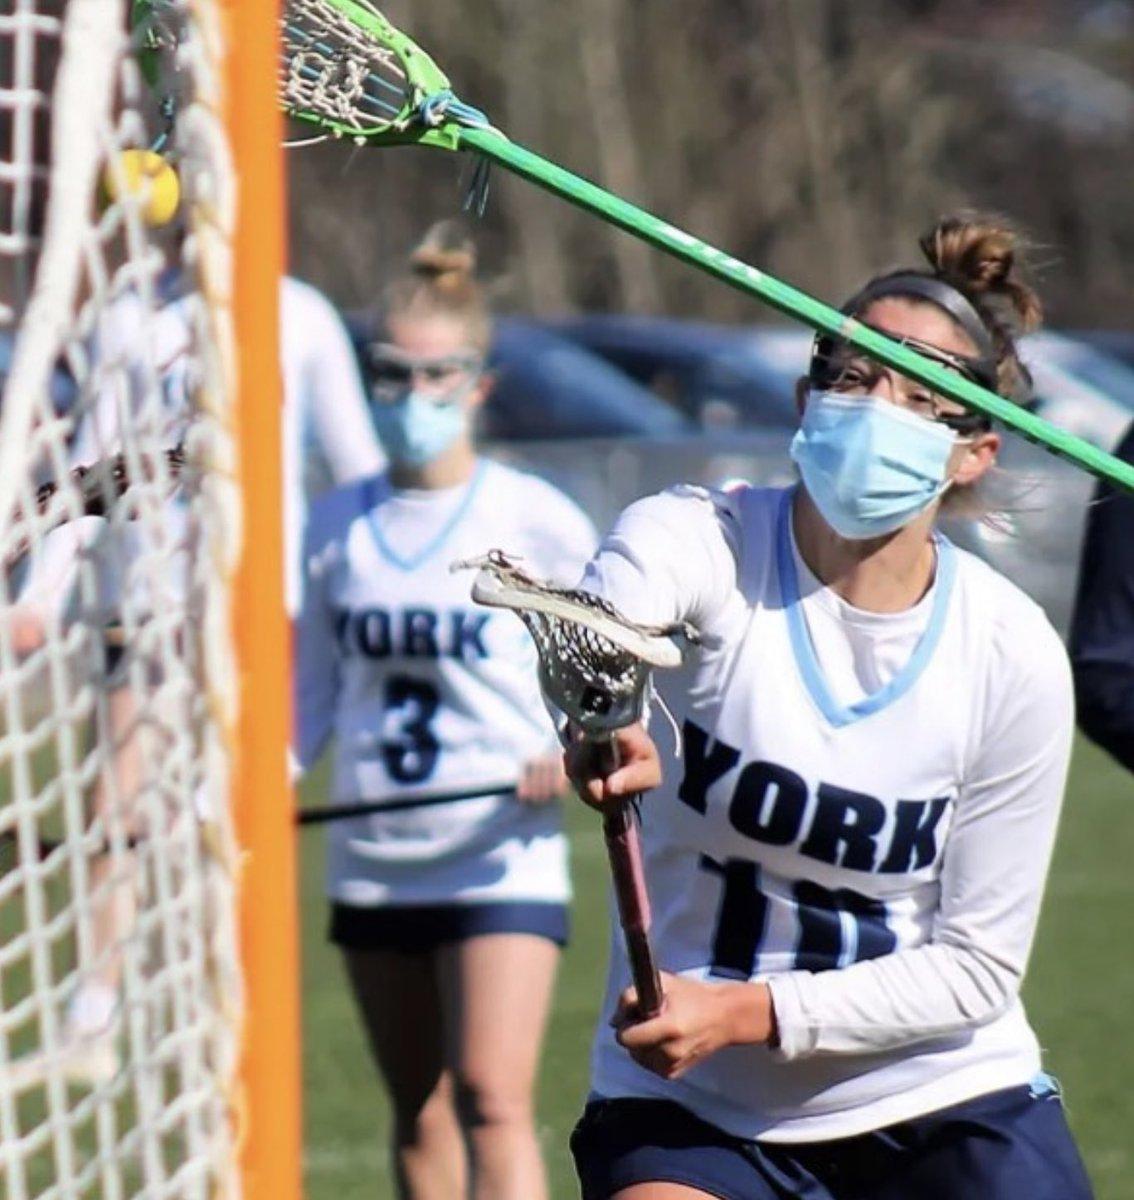 test Twitter Media - Wildcats in Action Today: Class B State Quarterfinals Women's Lacrosse 🥍🐾  #4 York vs. #5 Camden Hills   4PM HOME at York High School  Let's Go! https://t.co/L5IHsrPheM